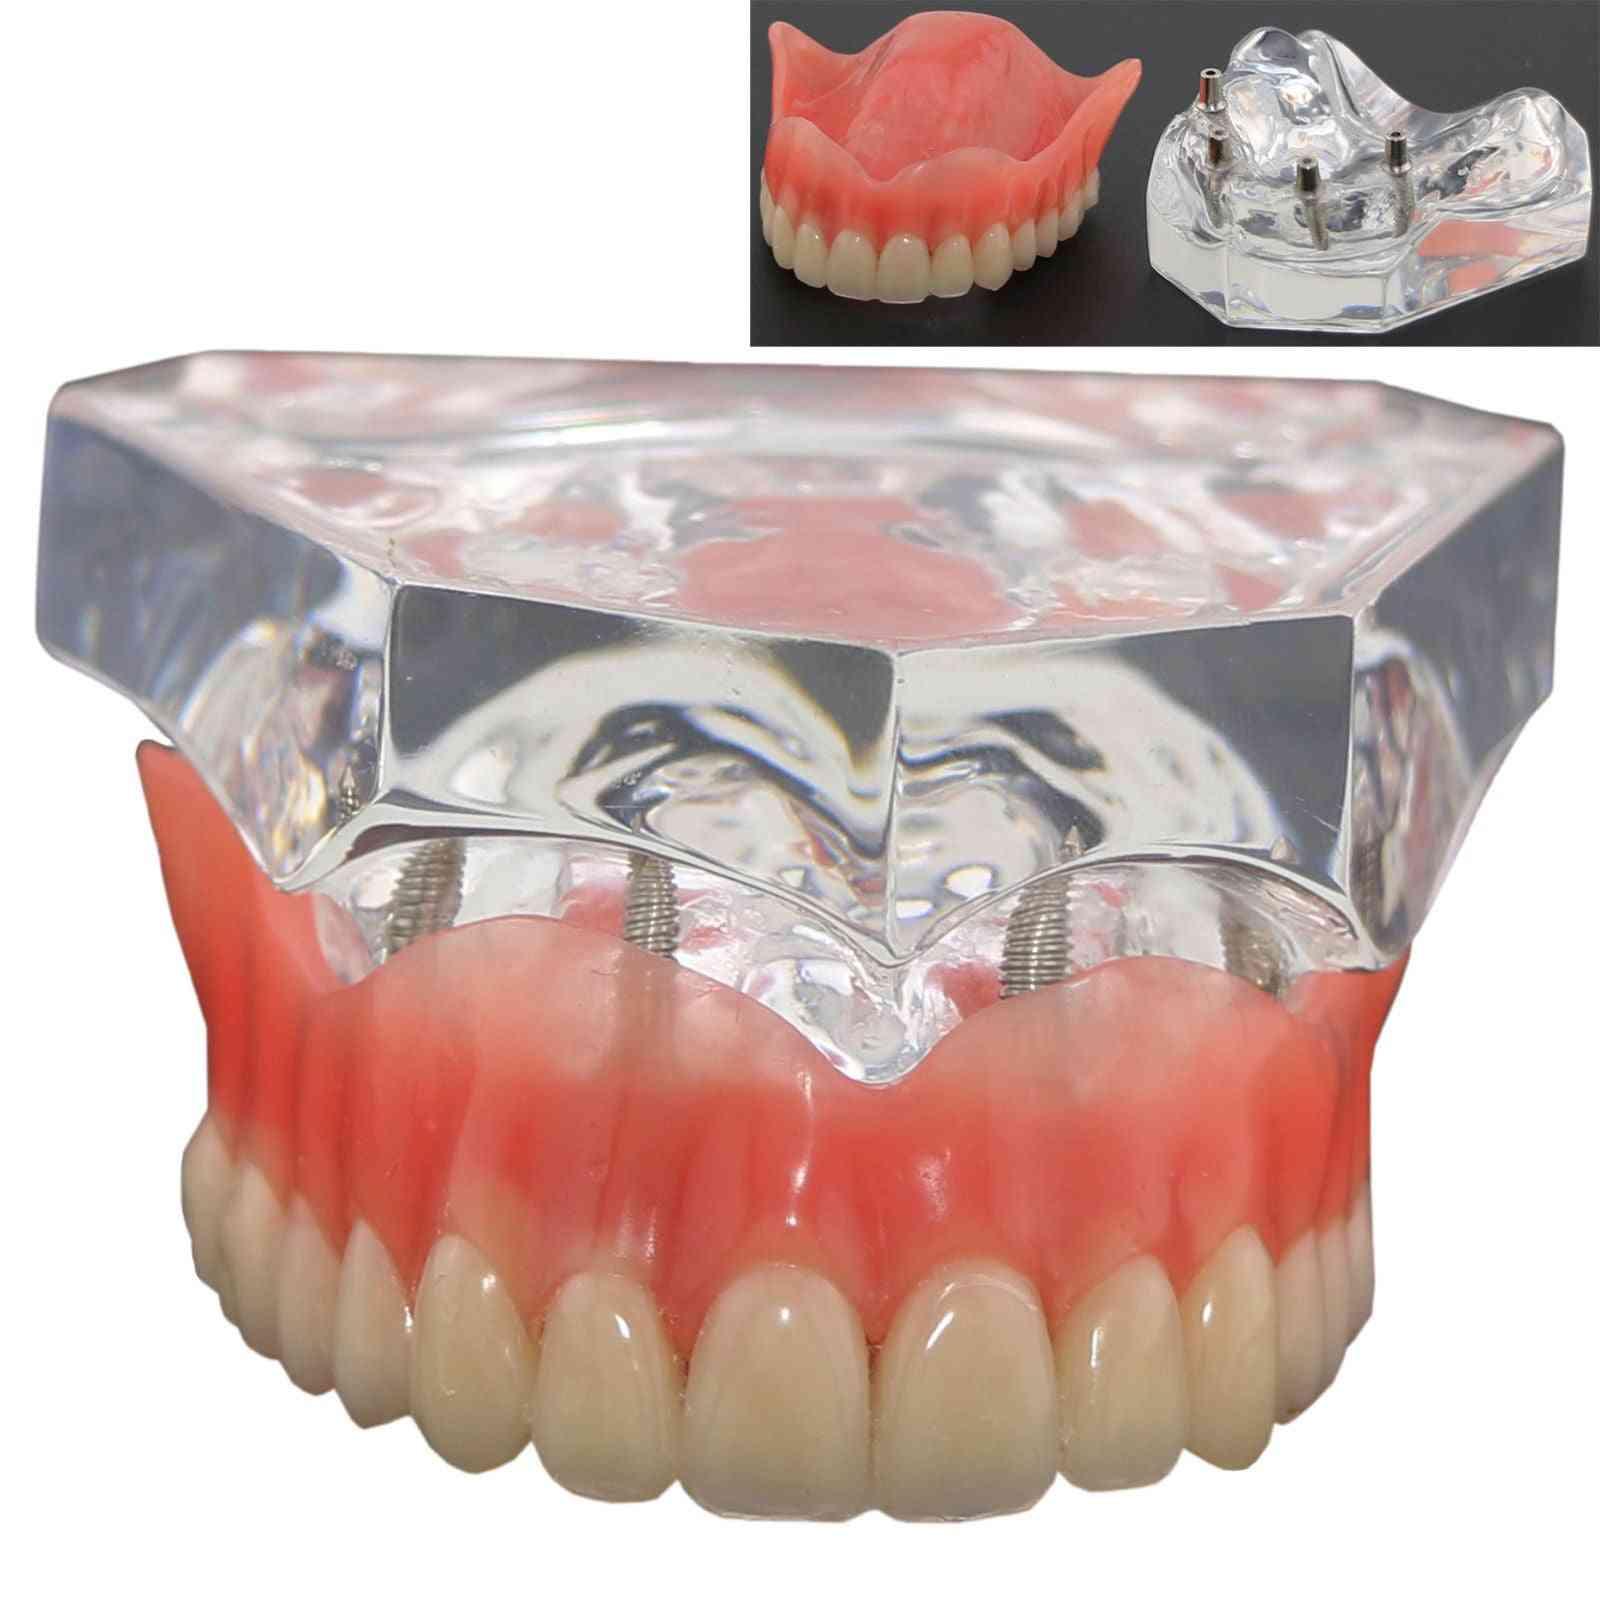 1pcs Dental Upper Overdenture Superior 4 Implants Demo Model, Teeth Model